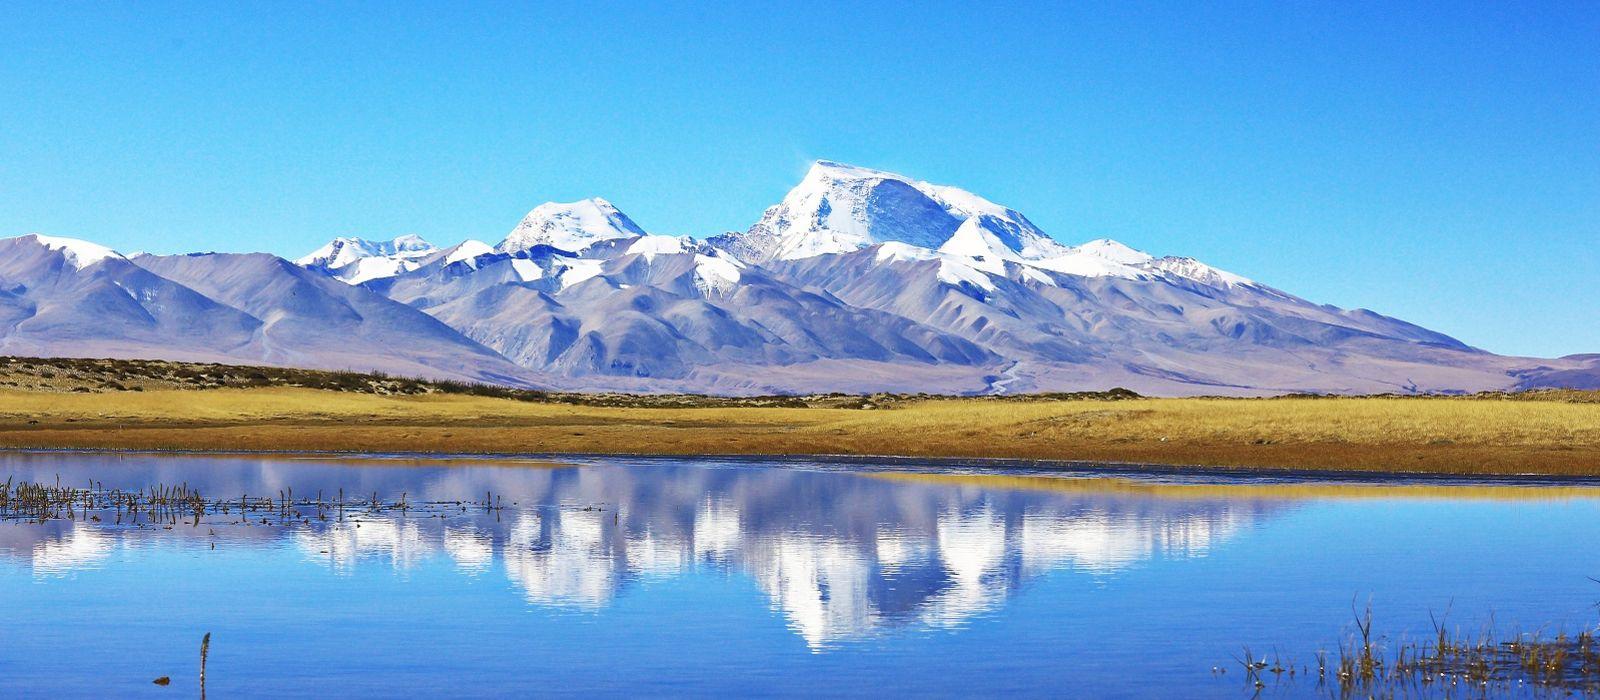 Highlights der Himalayas: Nepal, Bhutan und Tibet Urlaub 7